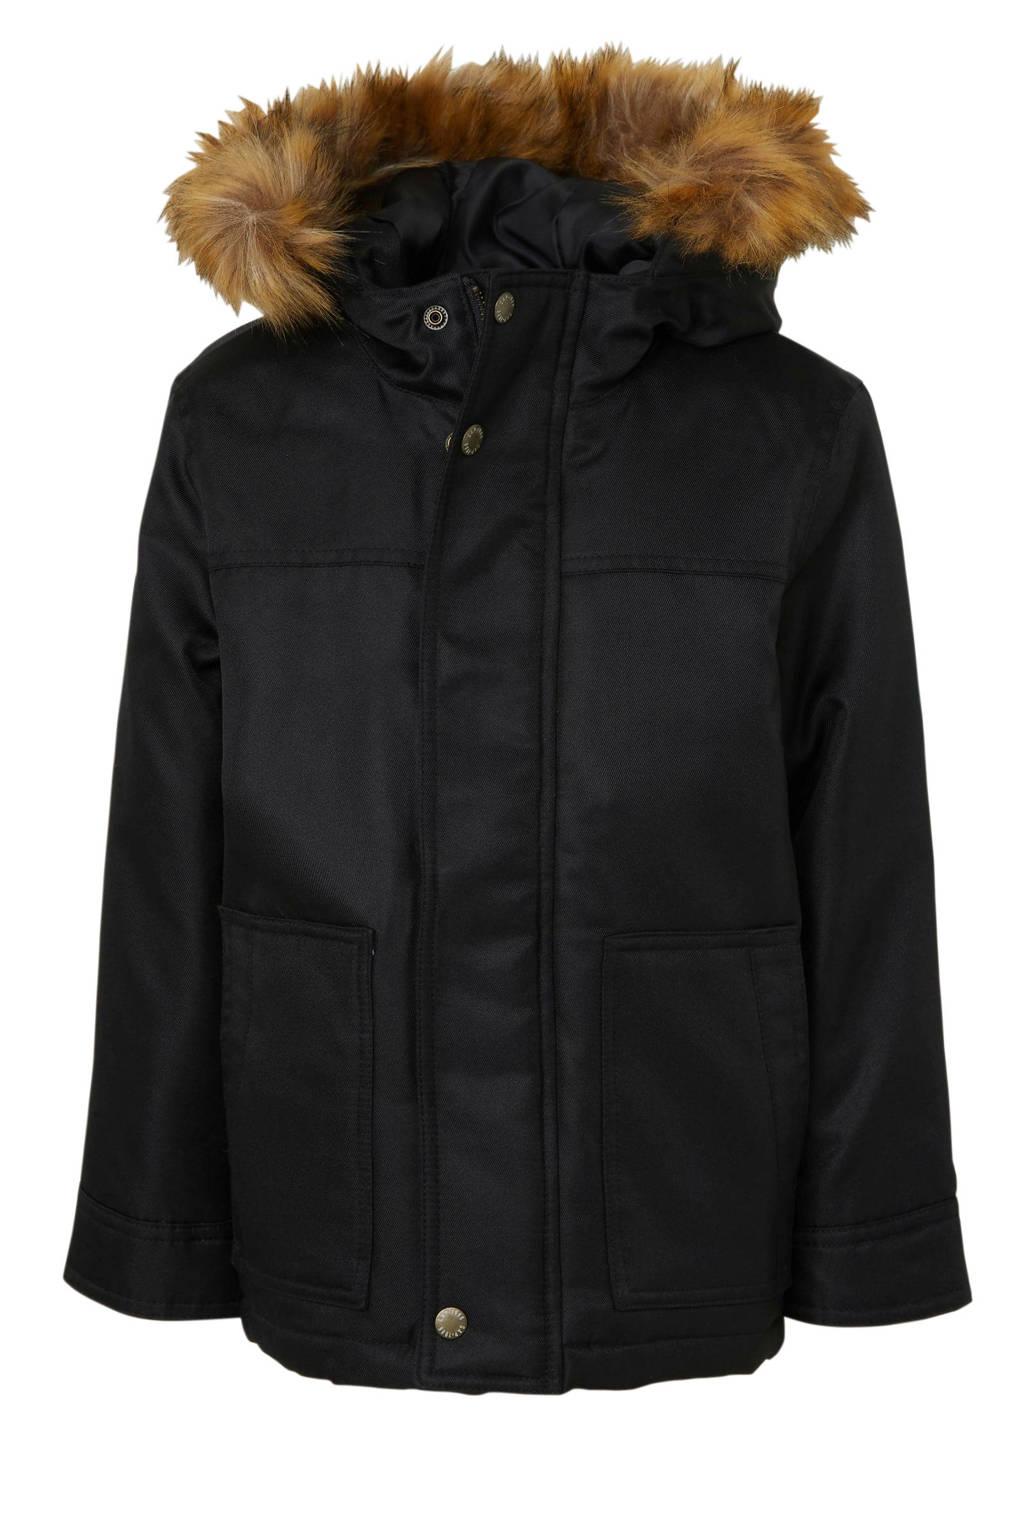 GAP parka winterjas zwart, Zwart